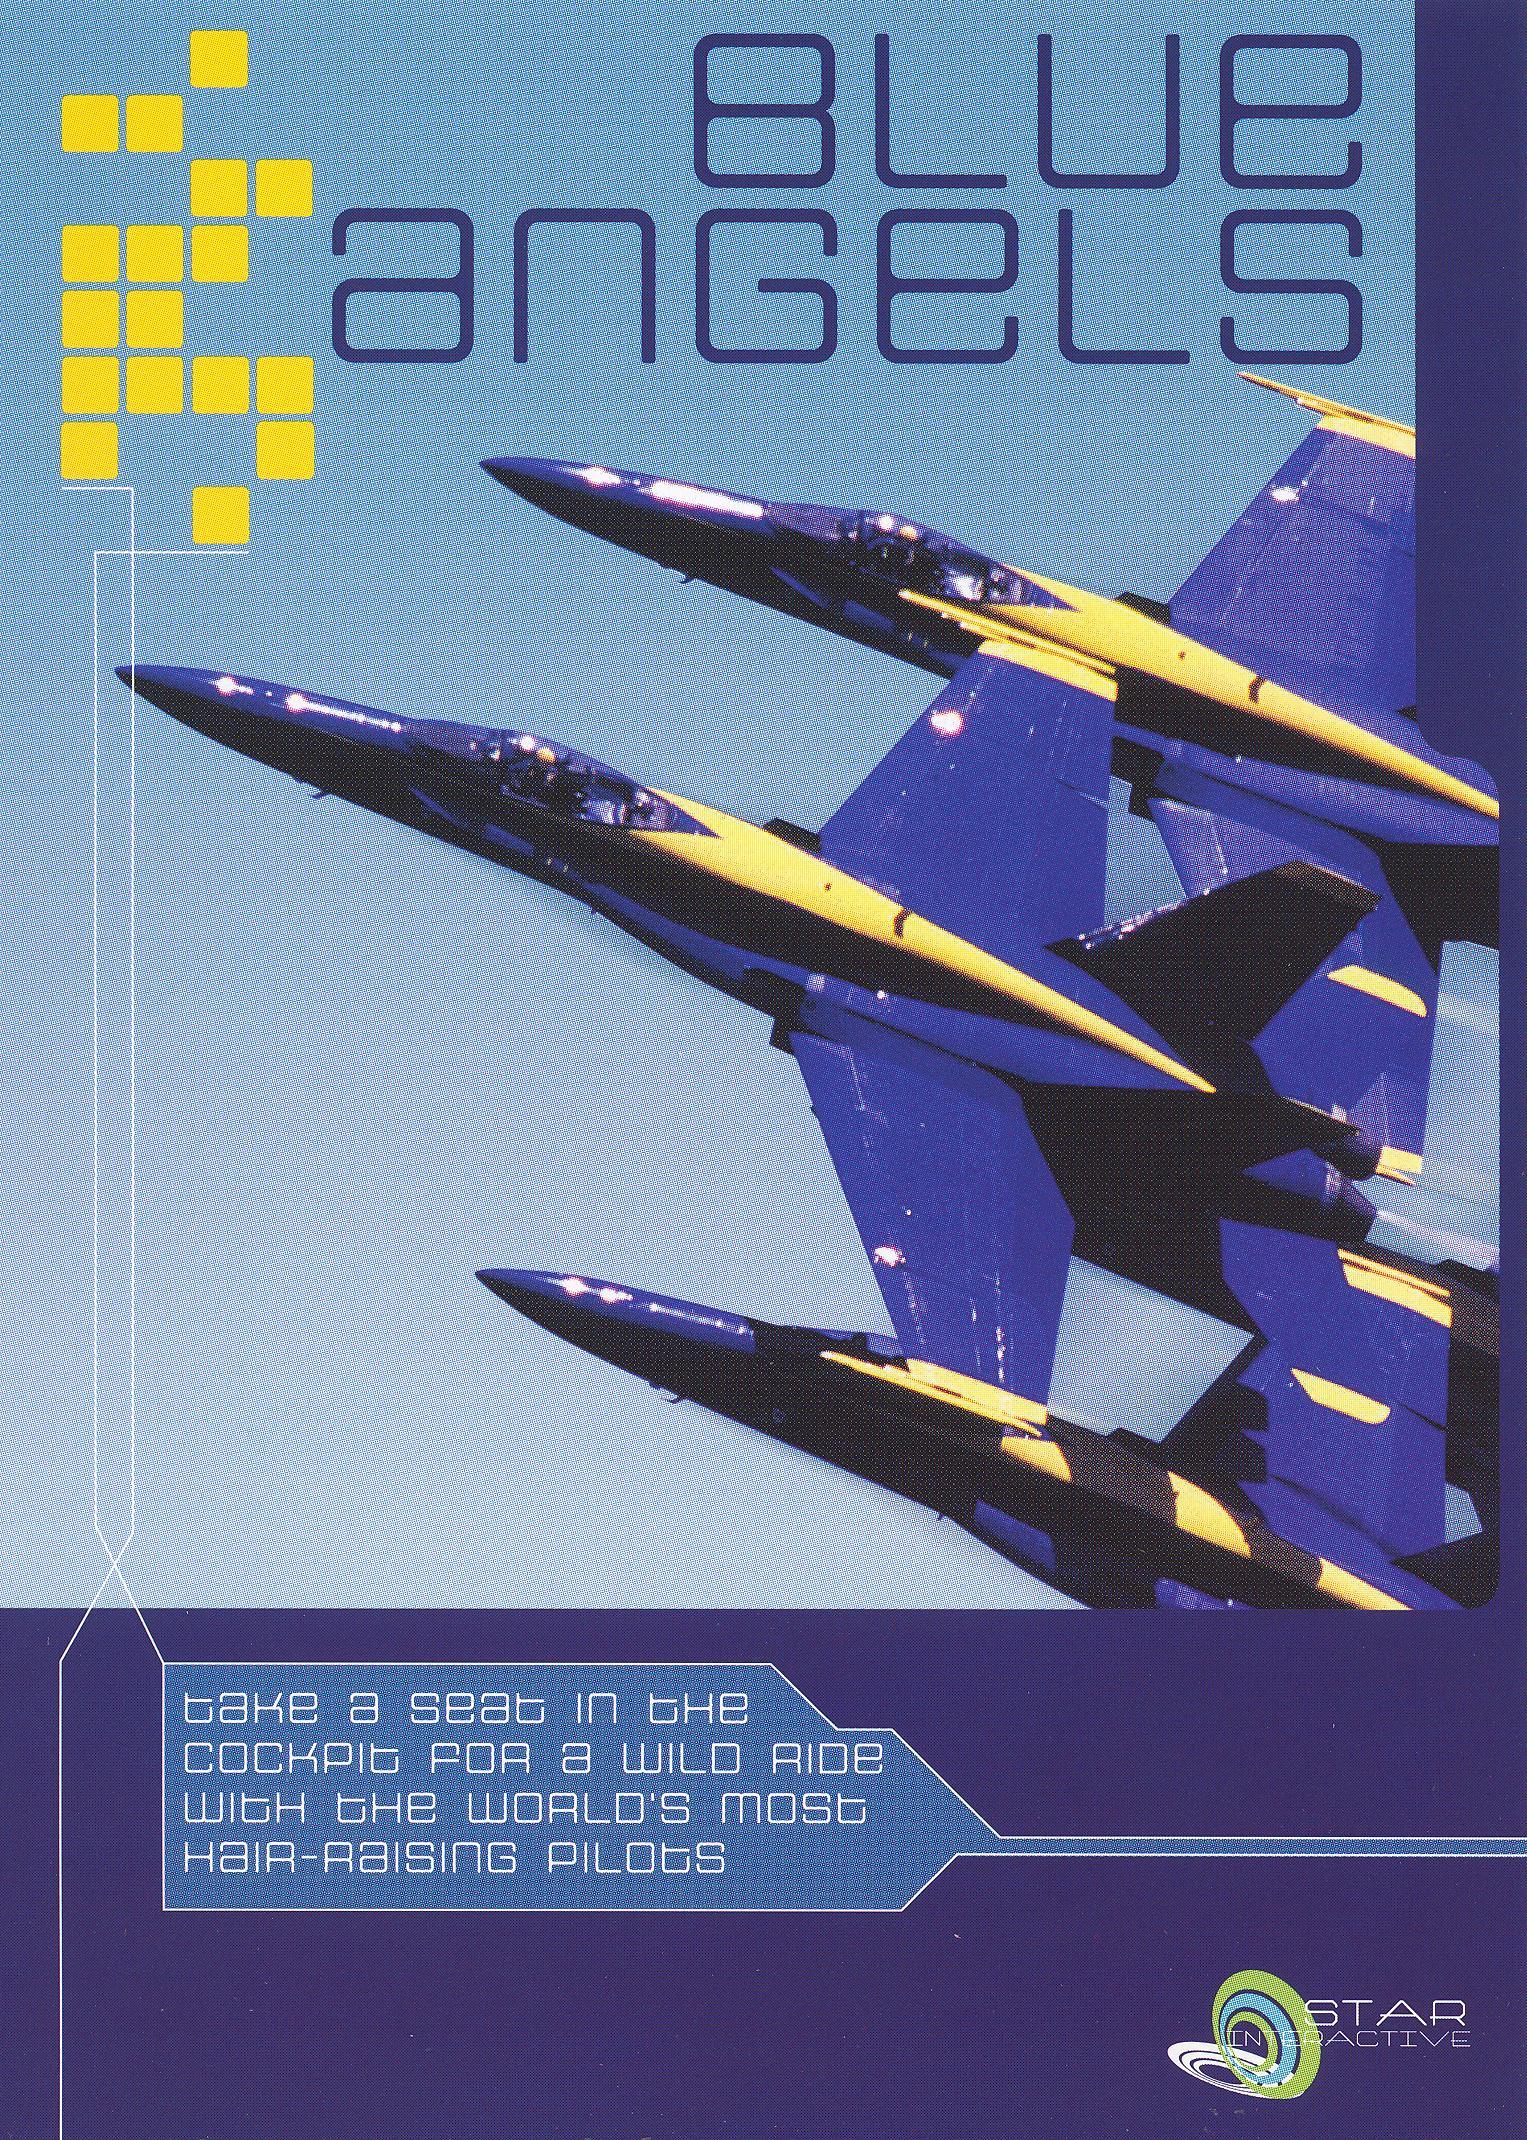 Jets: Altitude & Attitude, Vol. 4 - Blue Angels